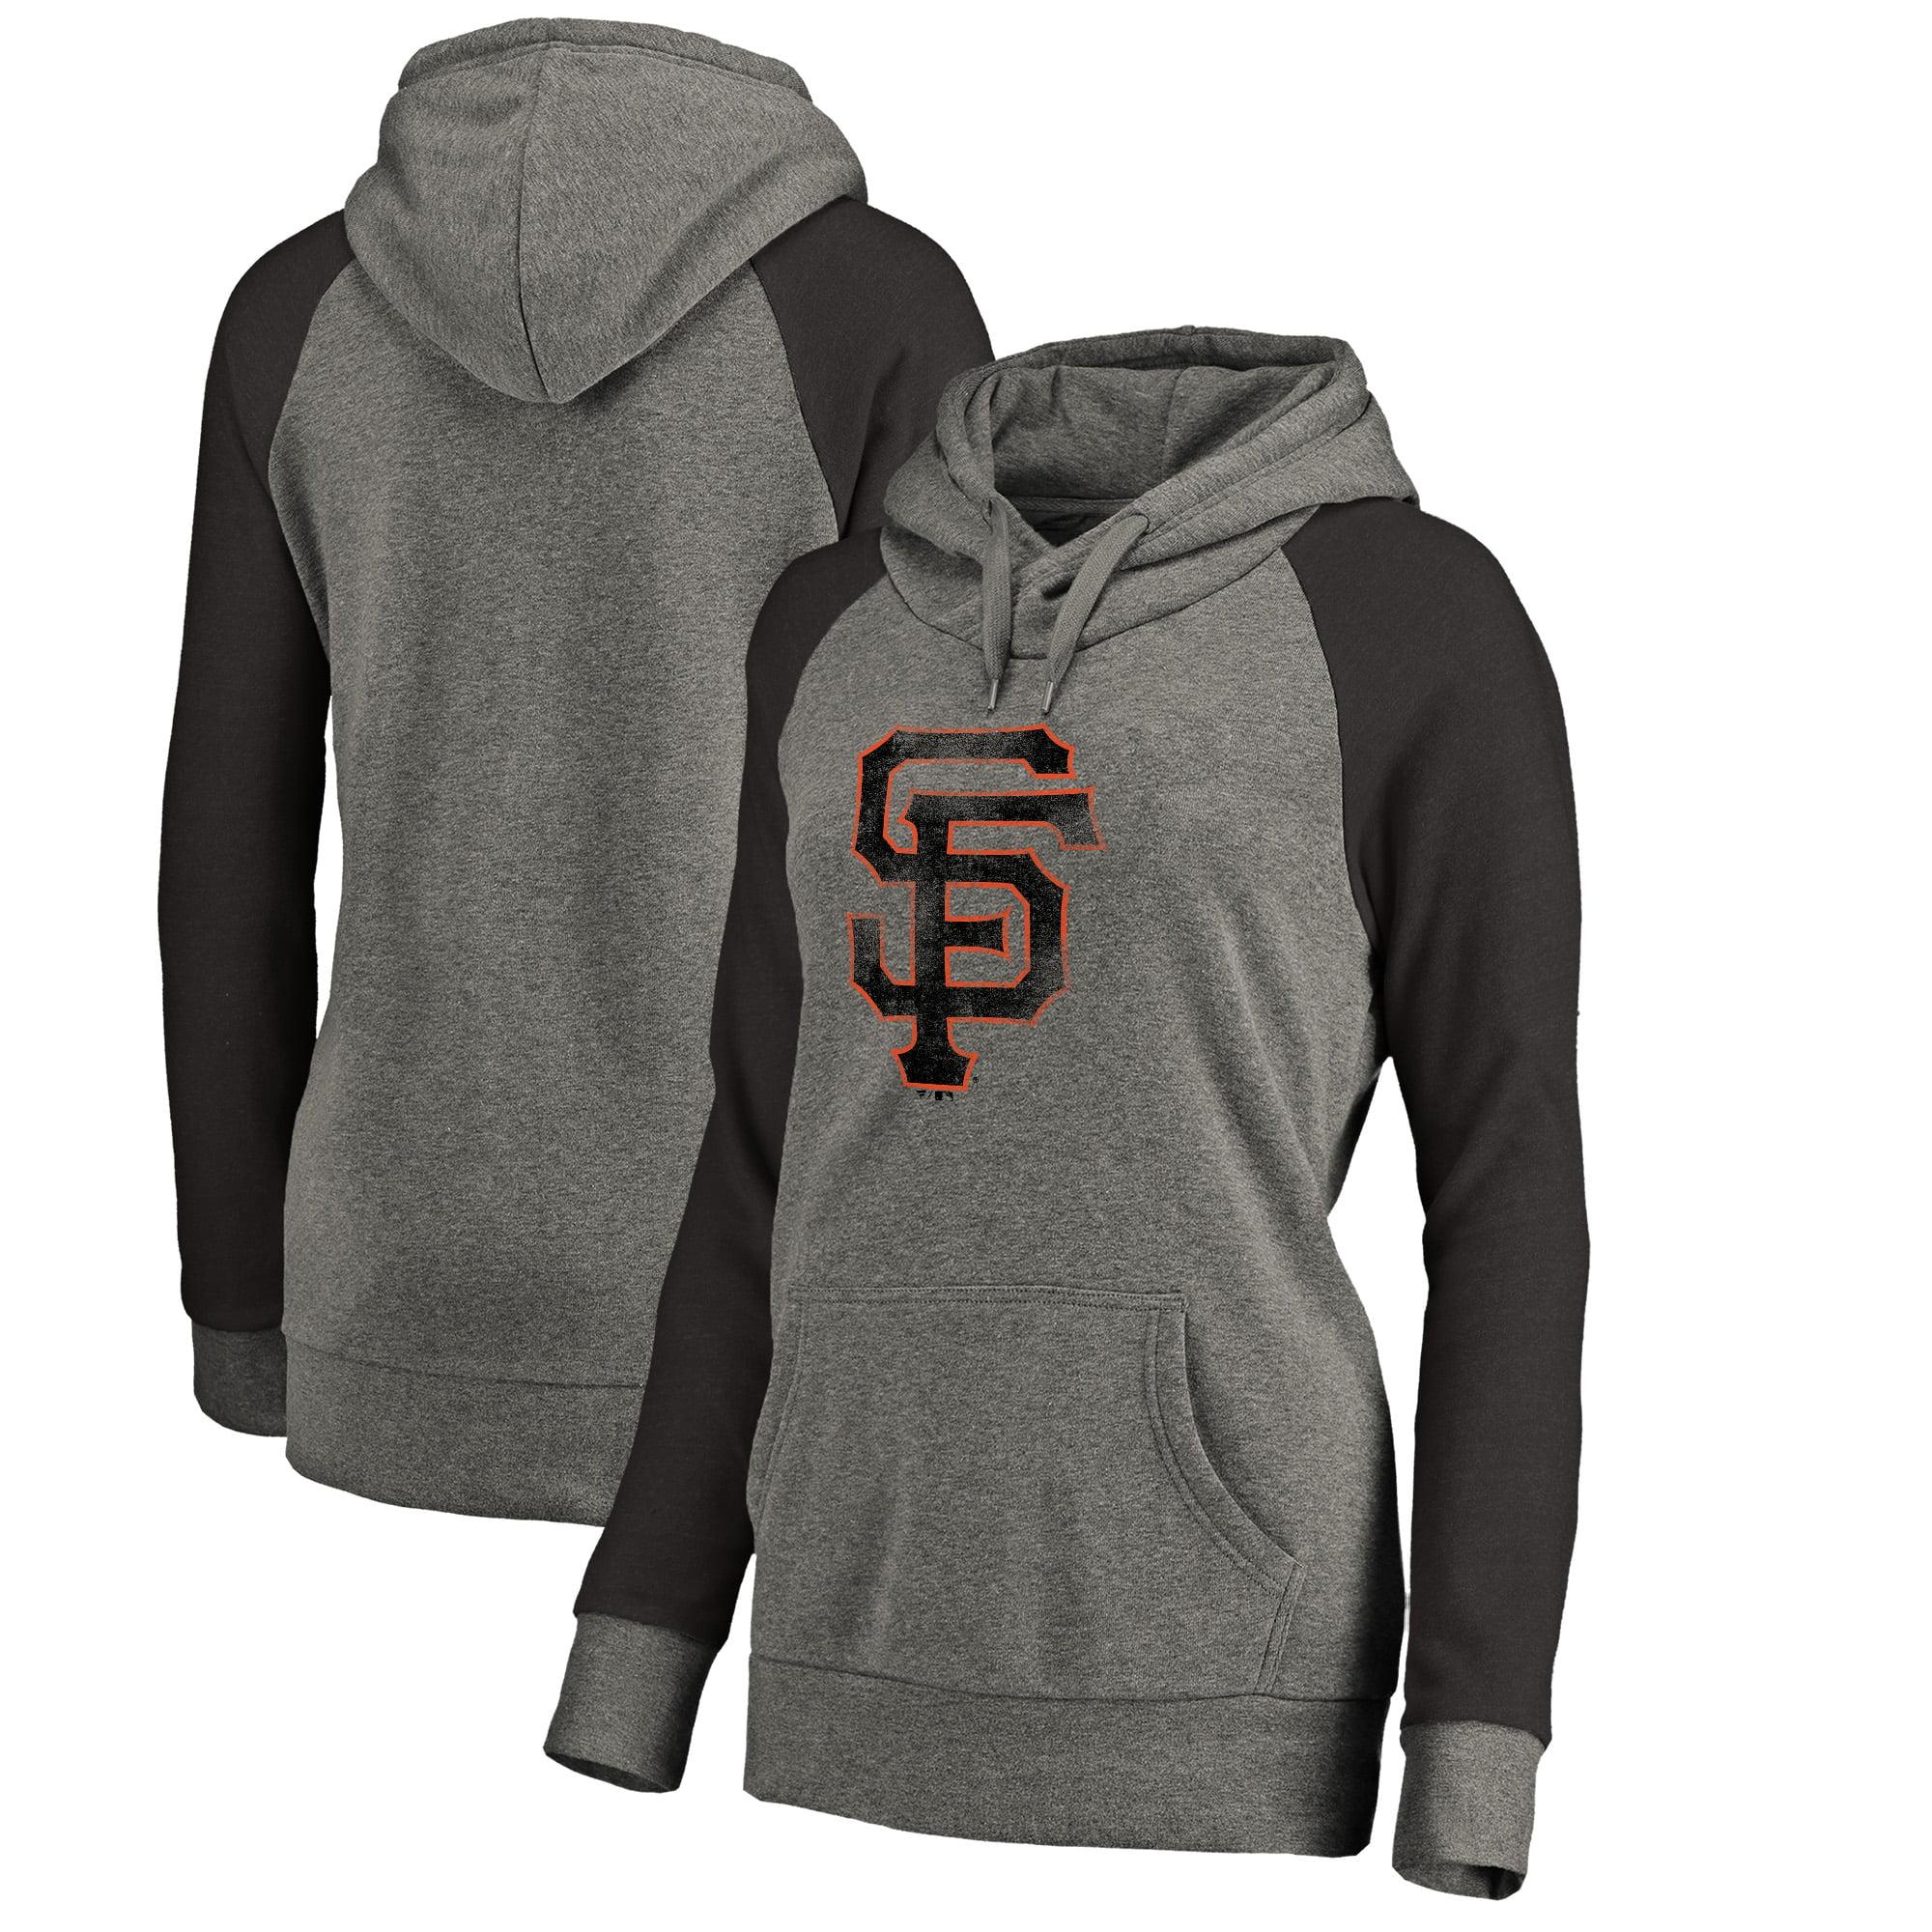 San Francisco Giants Fanatics Branded Women's Distressed Team Logo Tri-Blend Raglan Pullover Hoodie - Gray/Black